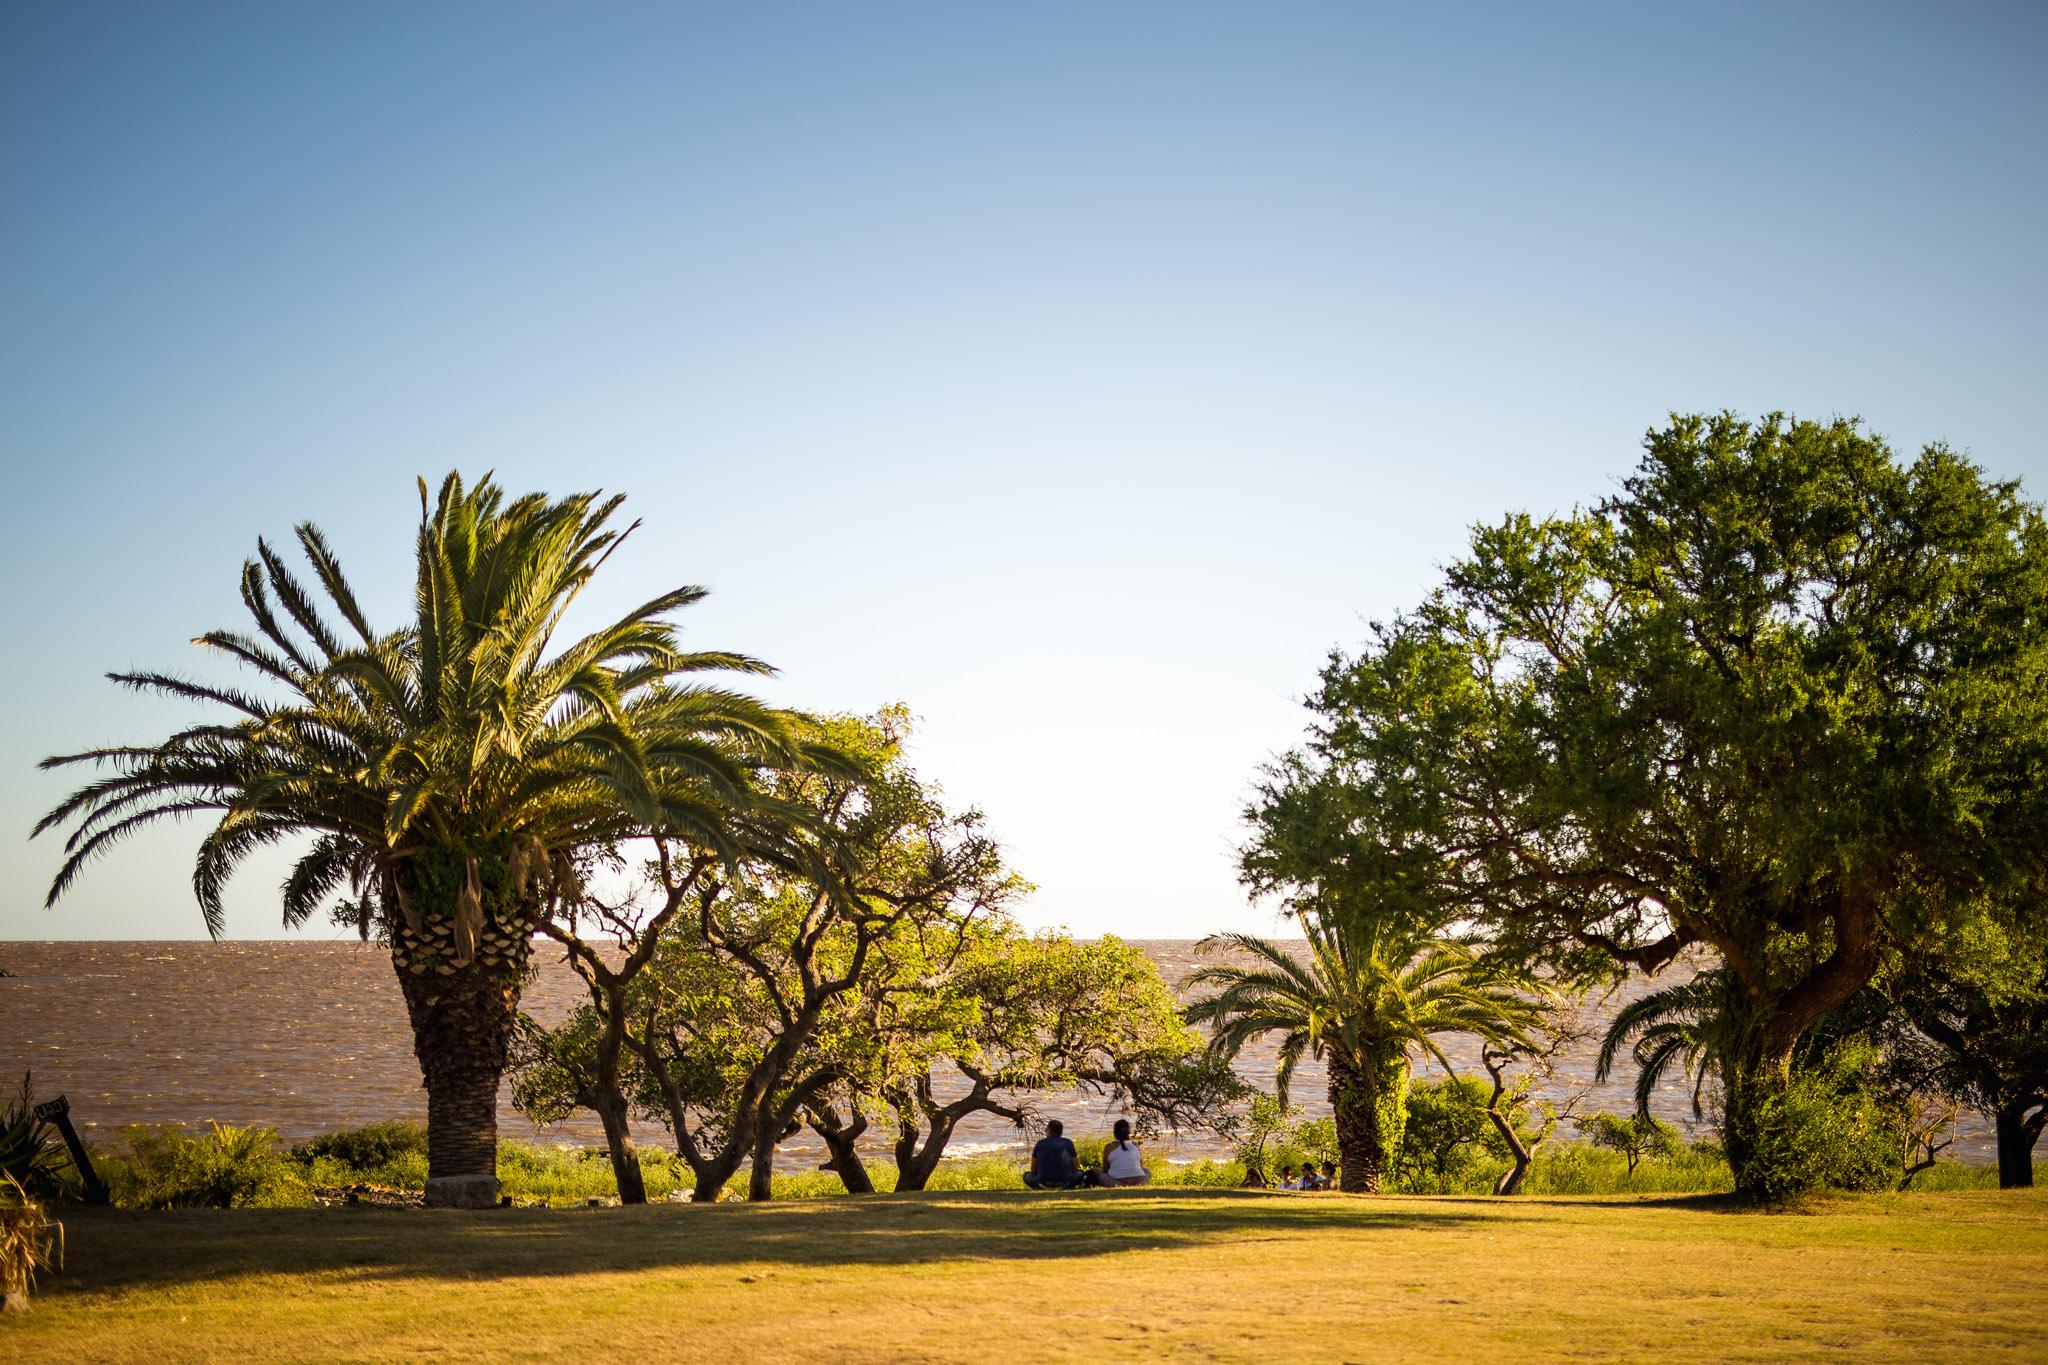 wedding-travellers-destination-photography-overlanding-south-america-uruguay-colonia-del-sacramento